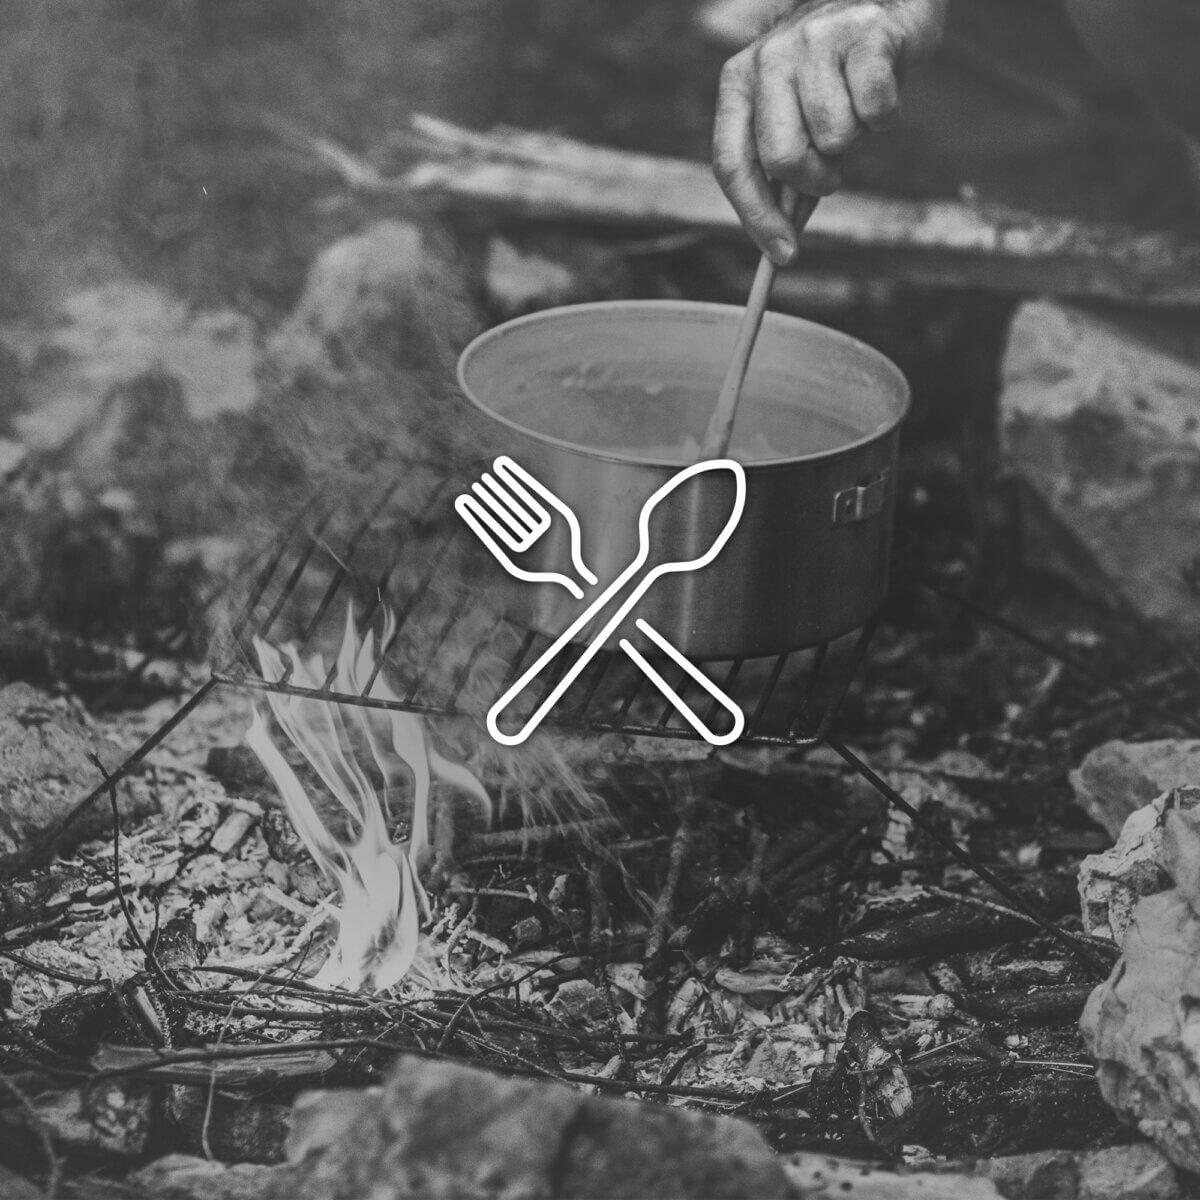 Camping Utensils, Cutlery, Flatware